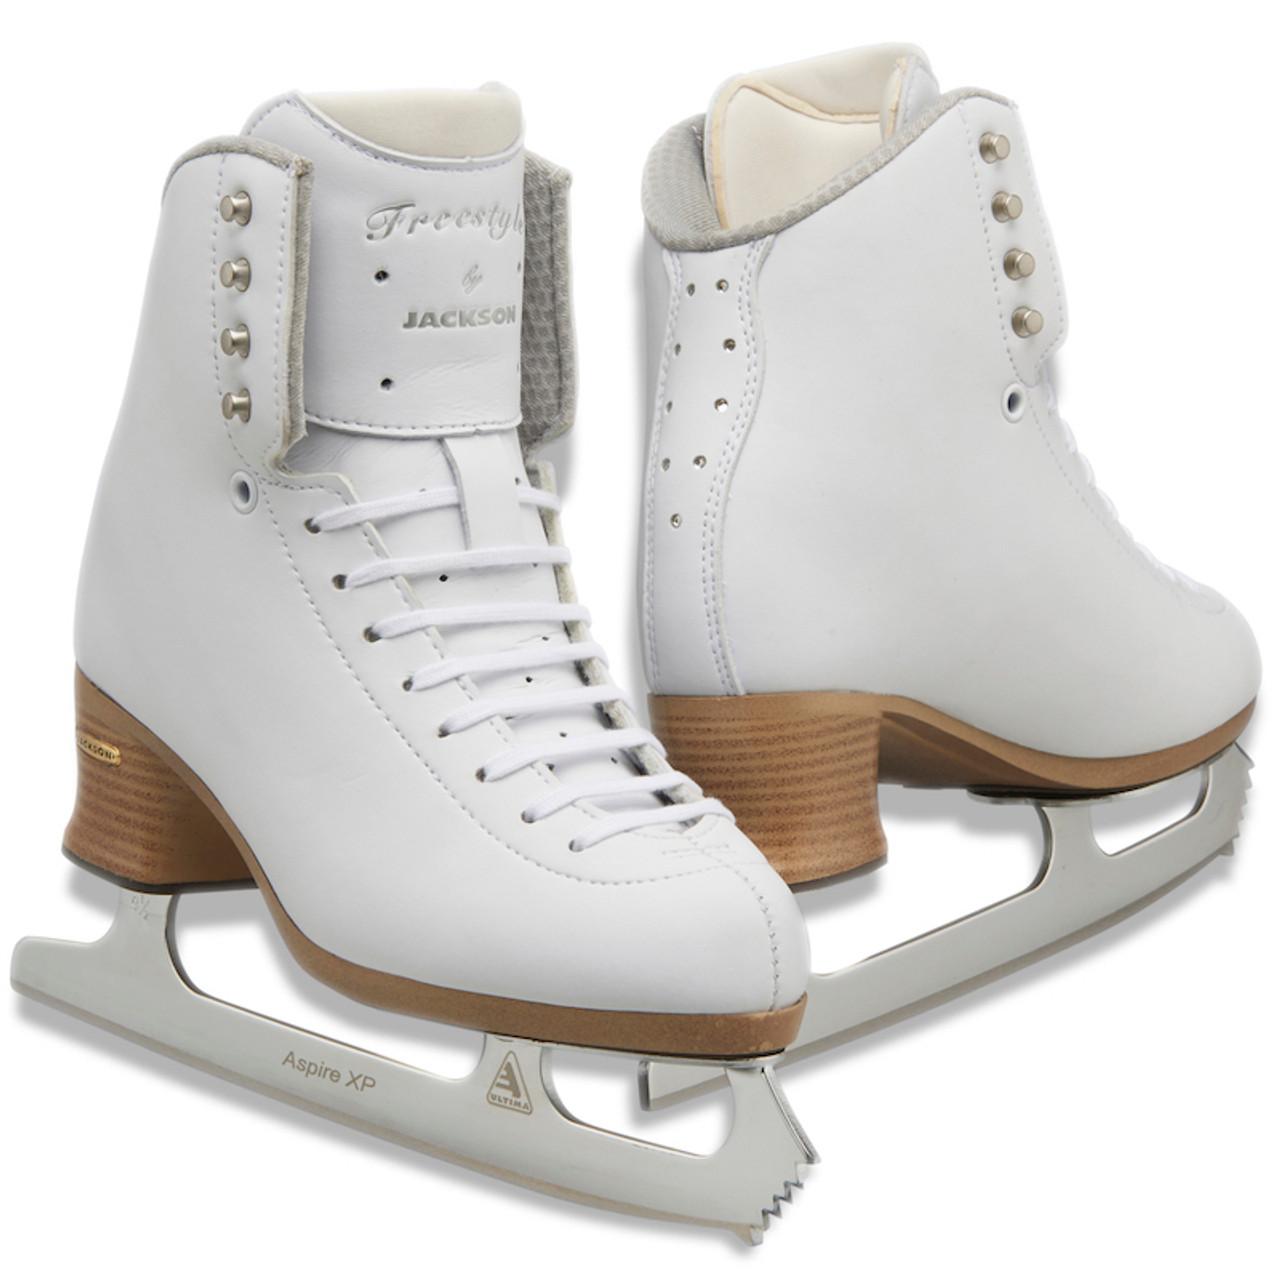 Jackson Freestyle Women's Figure Skates with Aspire Blade FS2190